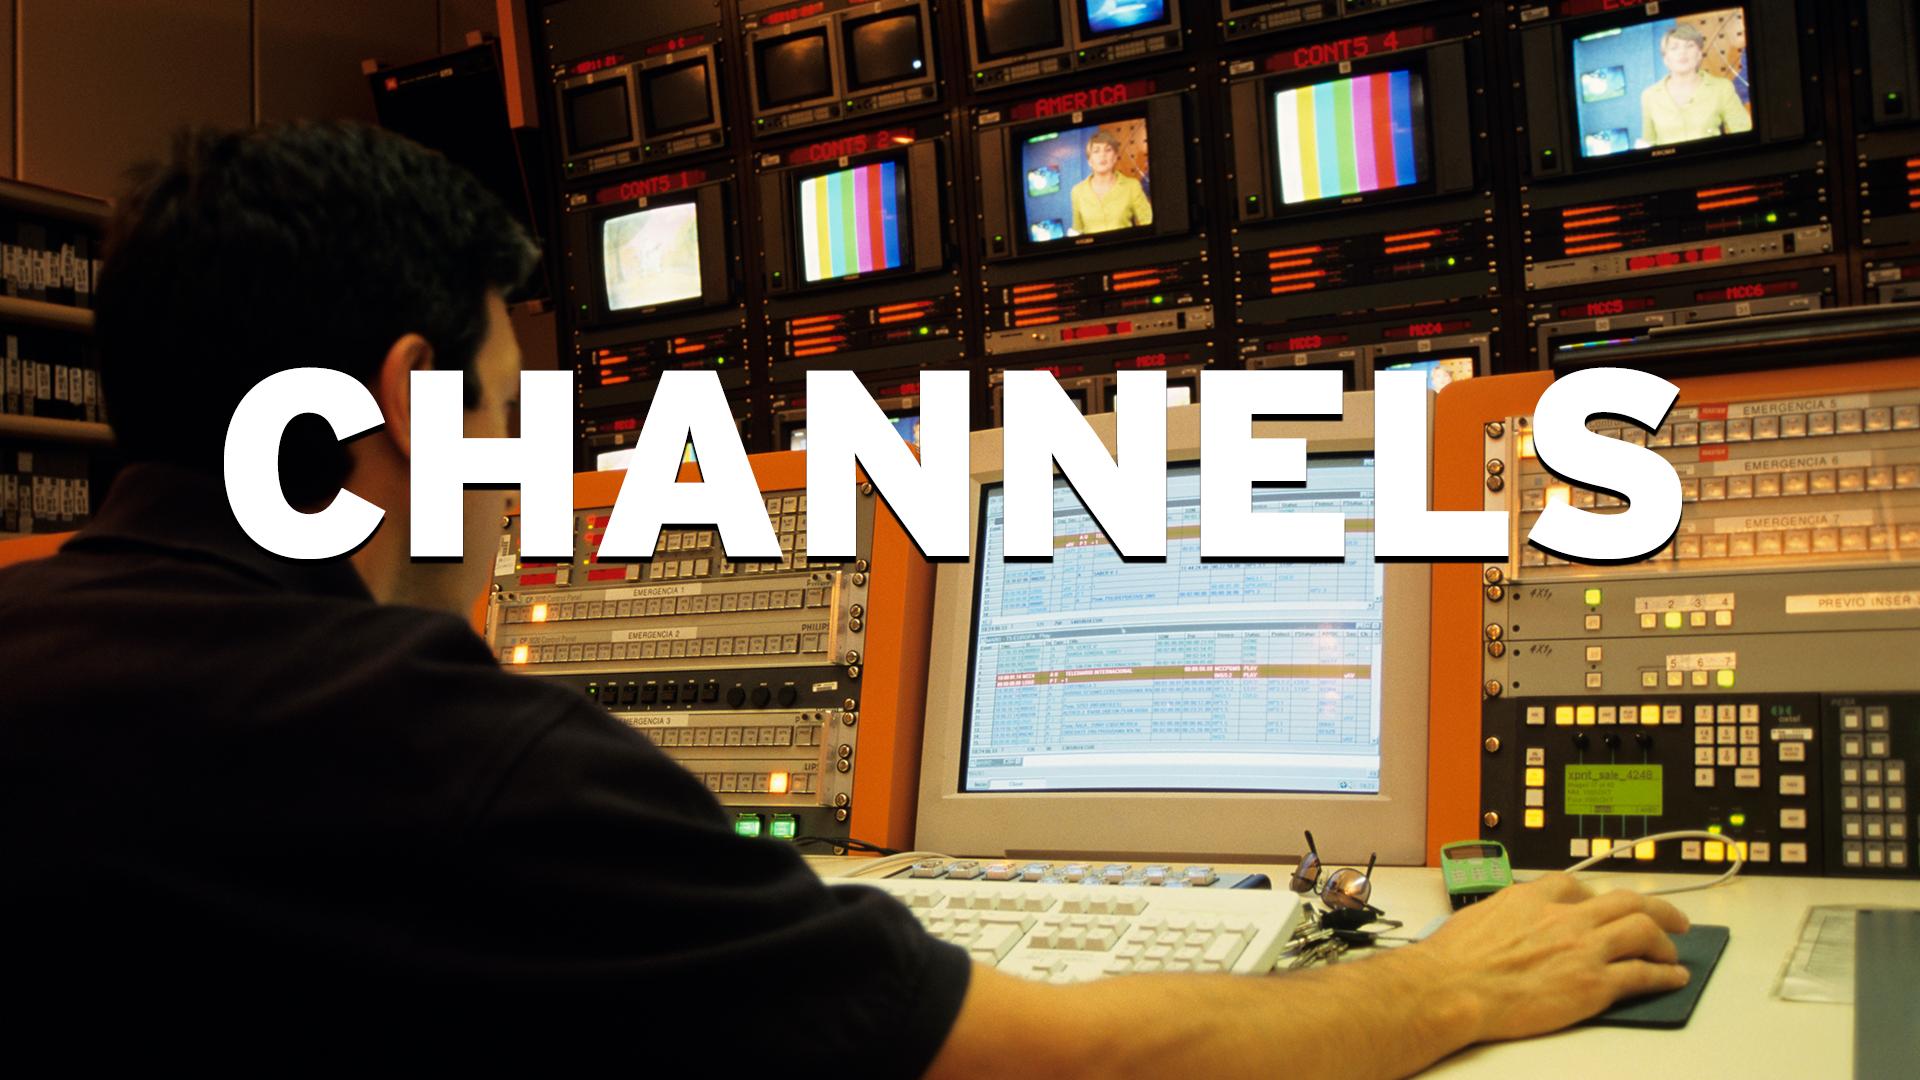 Digital channels image